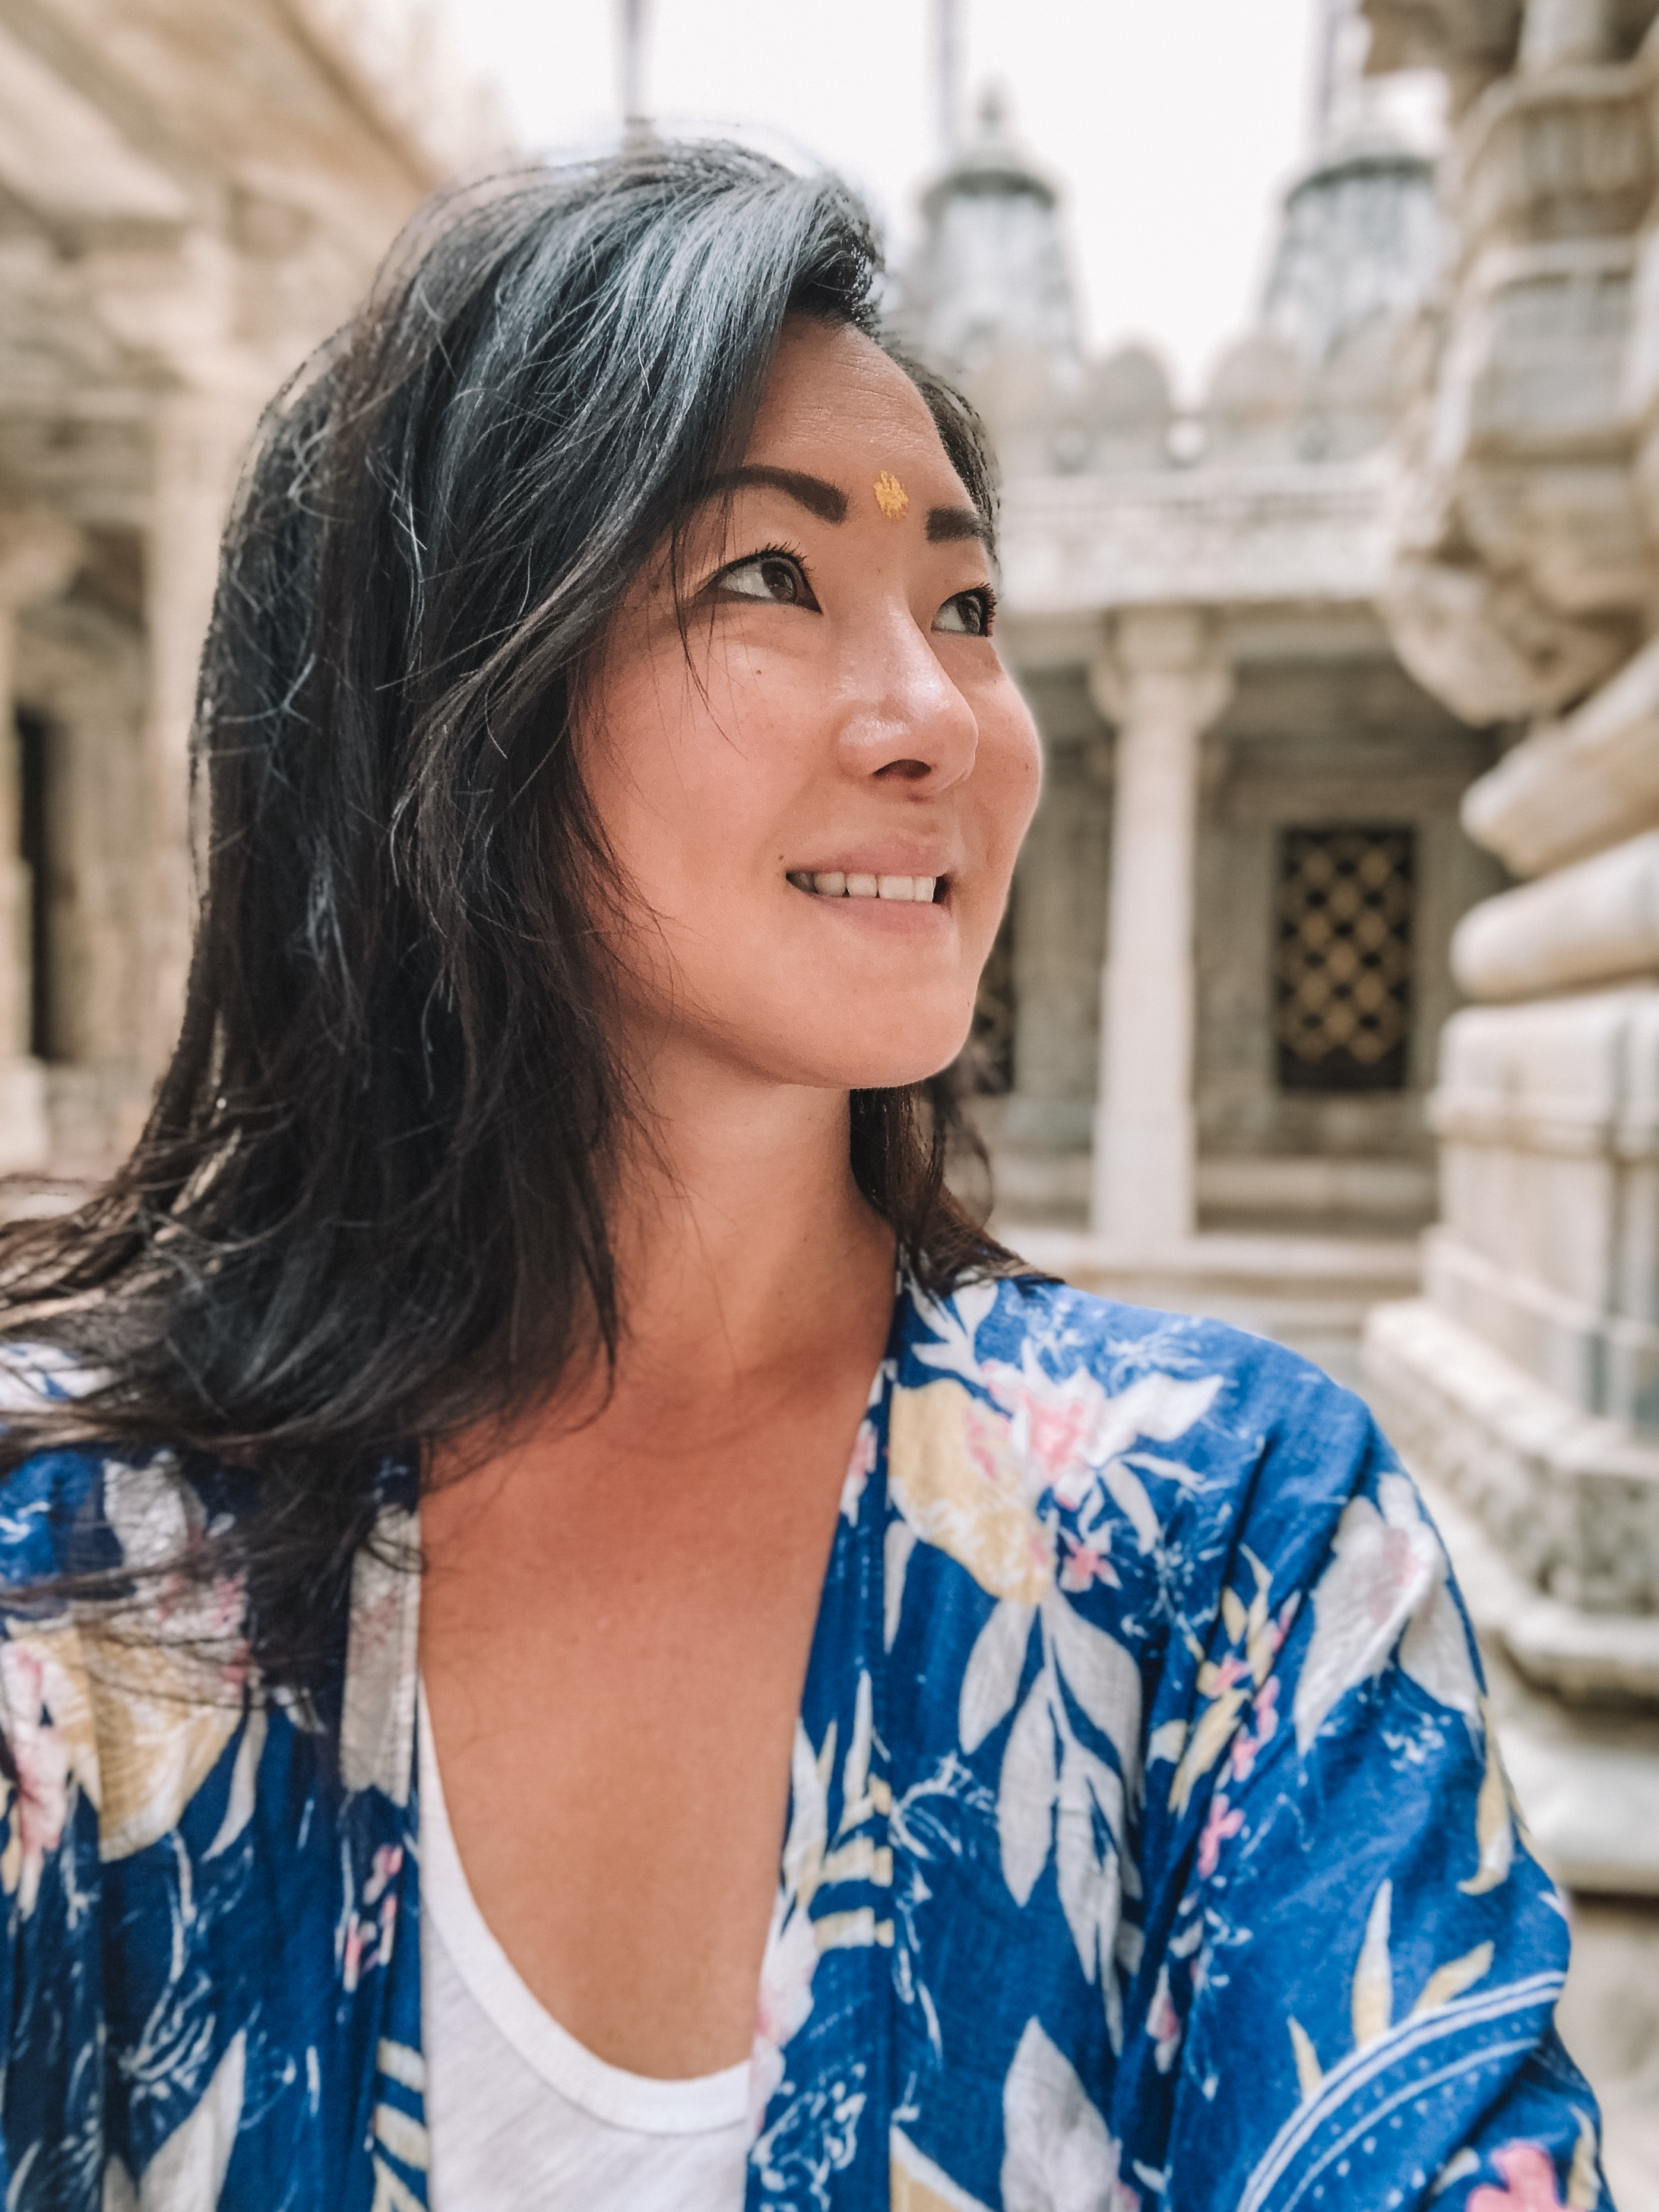 Laura Chung